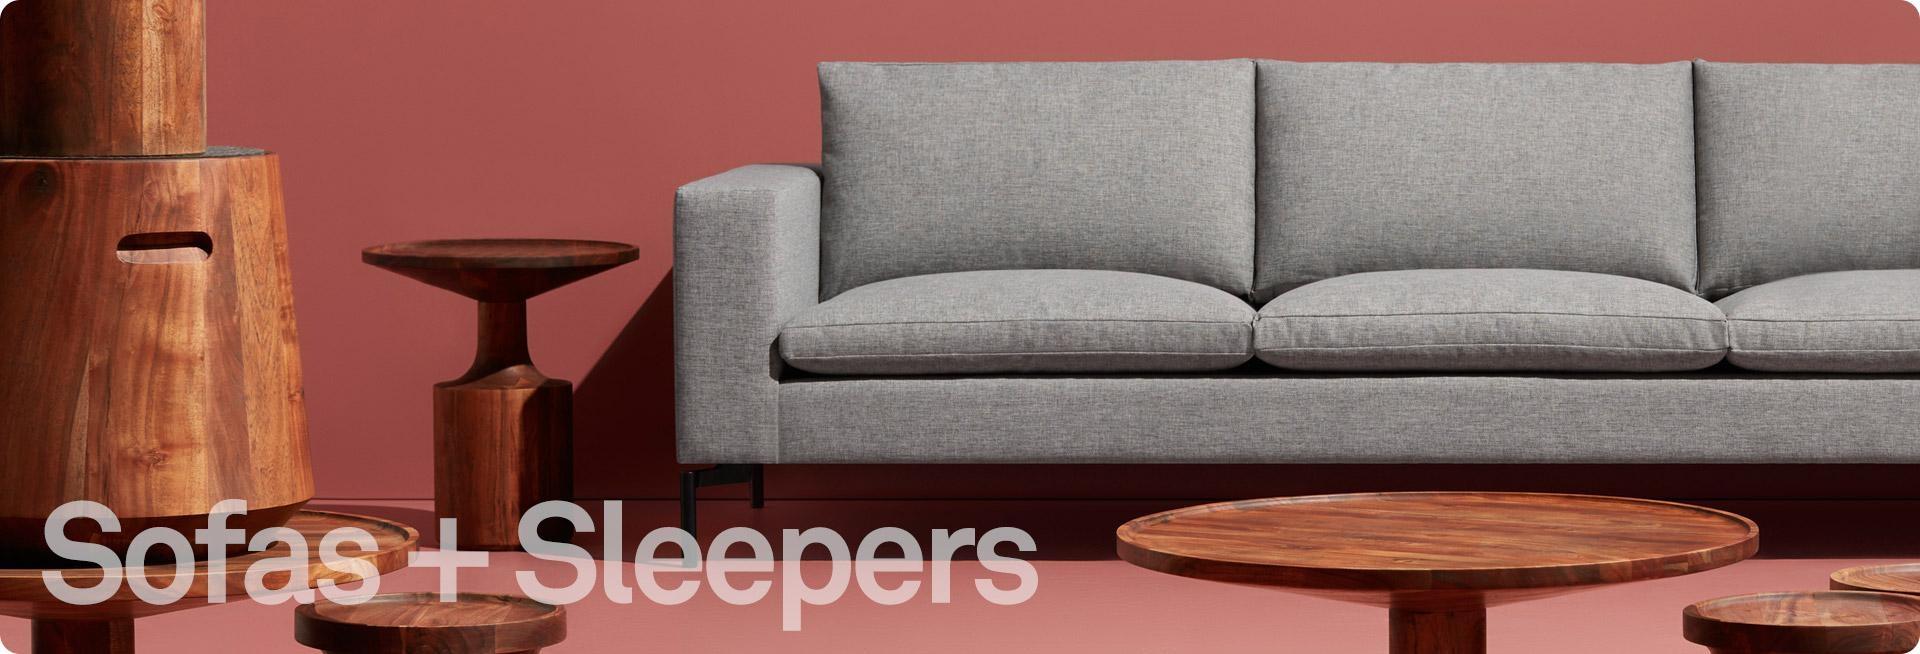 Sofas Center : Blu Dot Bank Sleeper Sofablu Diplomat Sofa Reviews With Blu Dot Sleeper Sofas (Image 17 of 20)